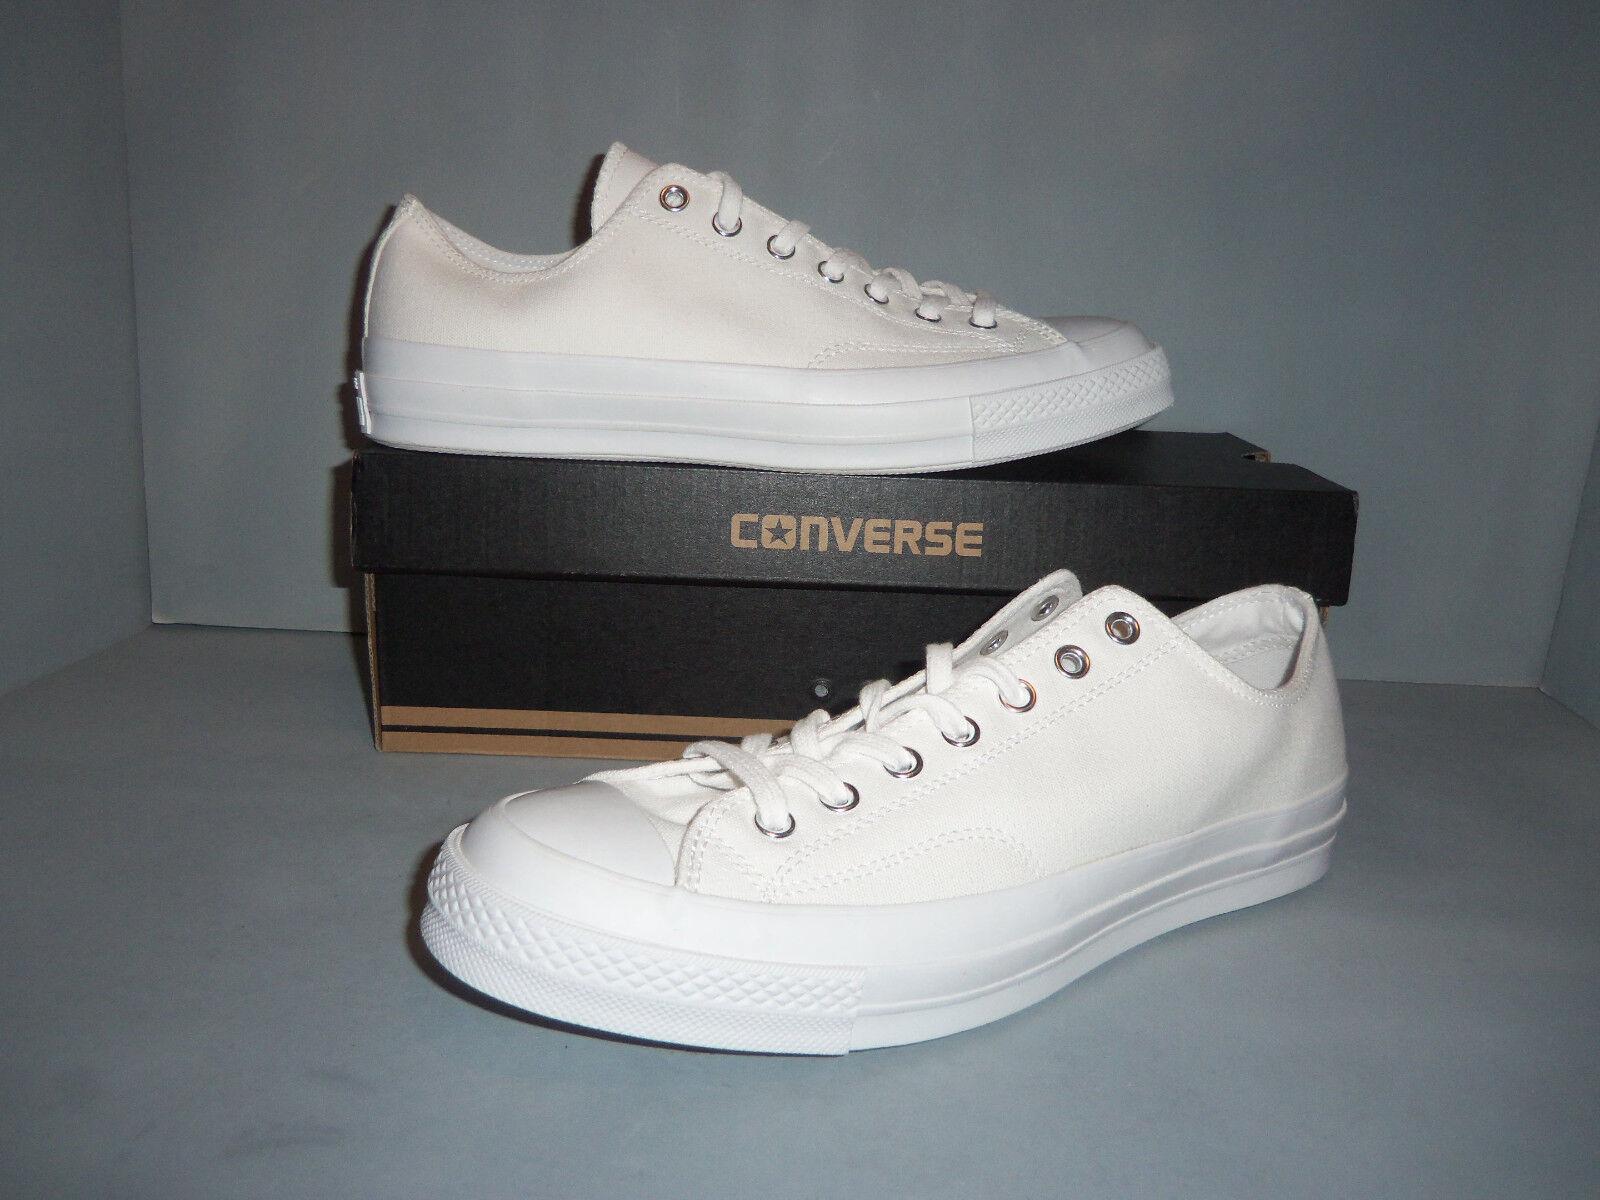 WHITE Uomo CONVERSE CHUCK TAYLOR ALL STAR 70 OX 1970 1147071C NIB NEW Sizes!!